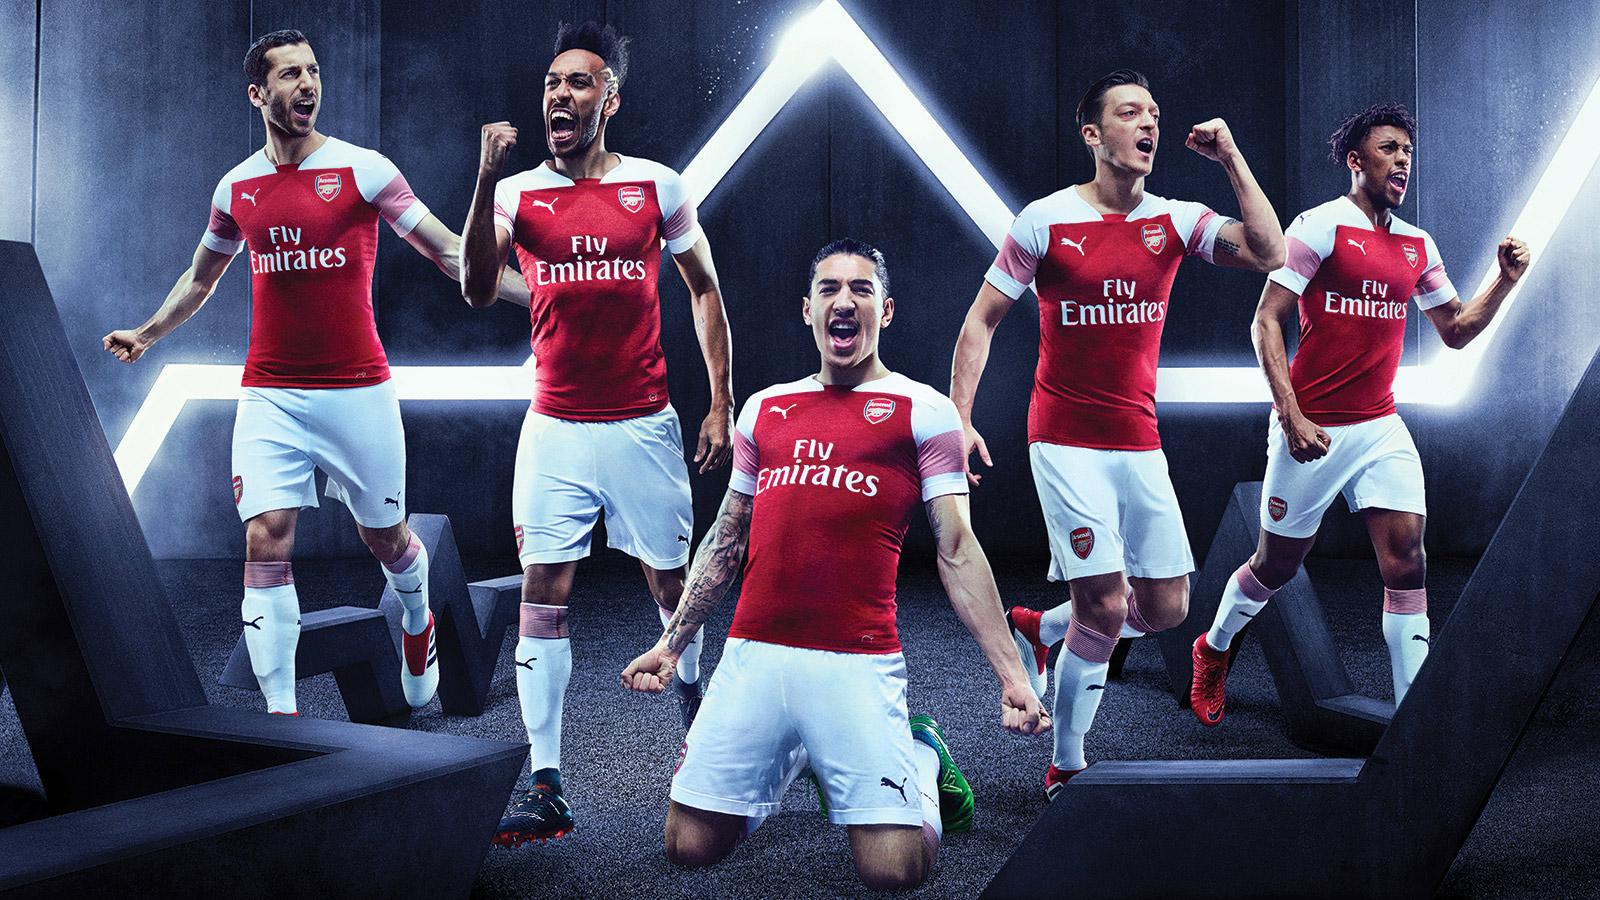 Arsenal and PUMA unveil 201819 home kit PUMA kit 201819 News 1600x900